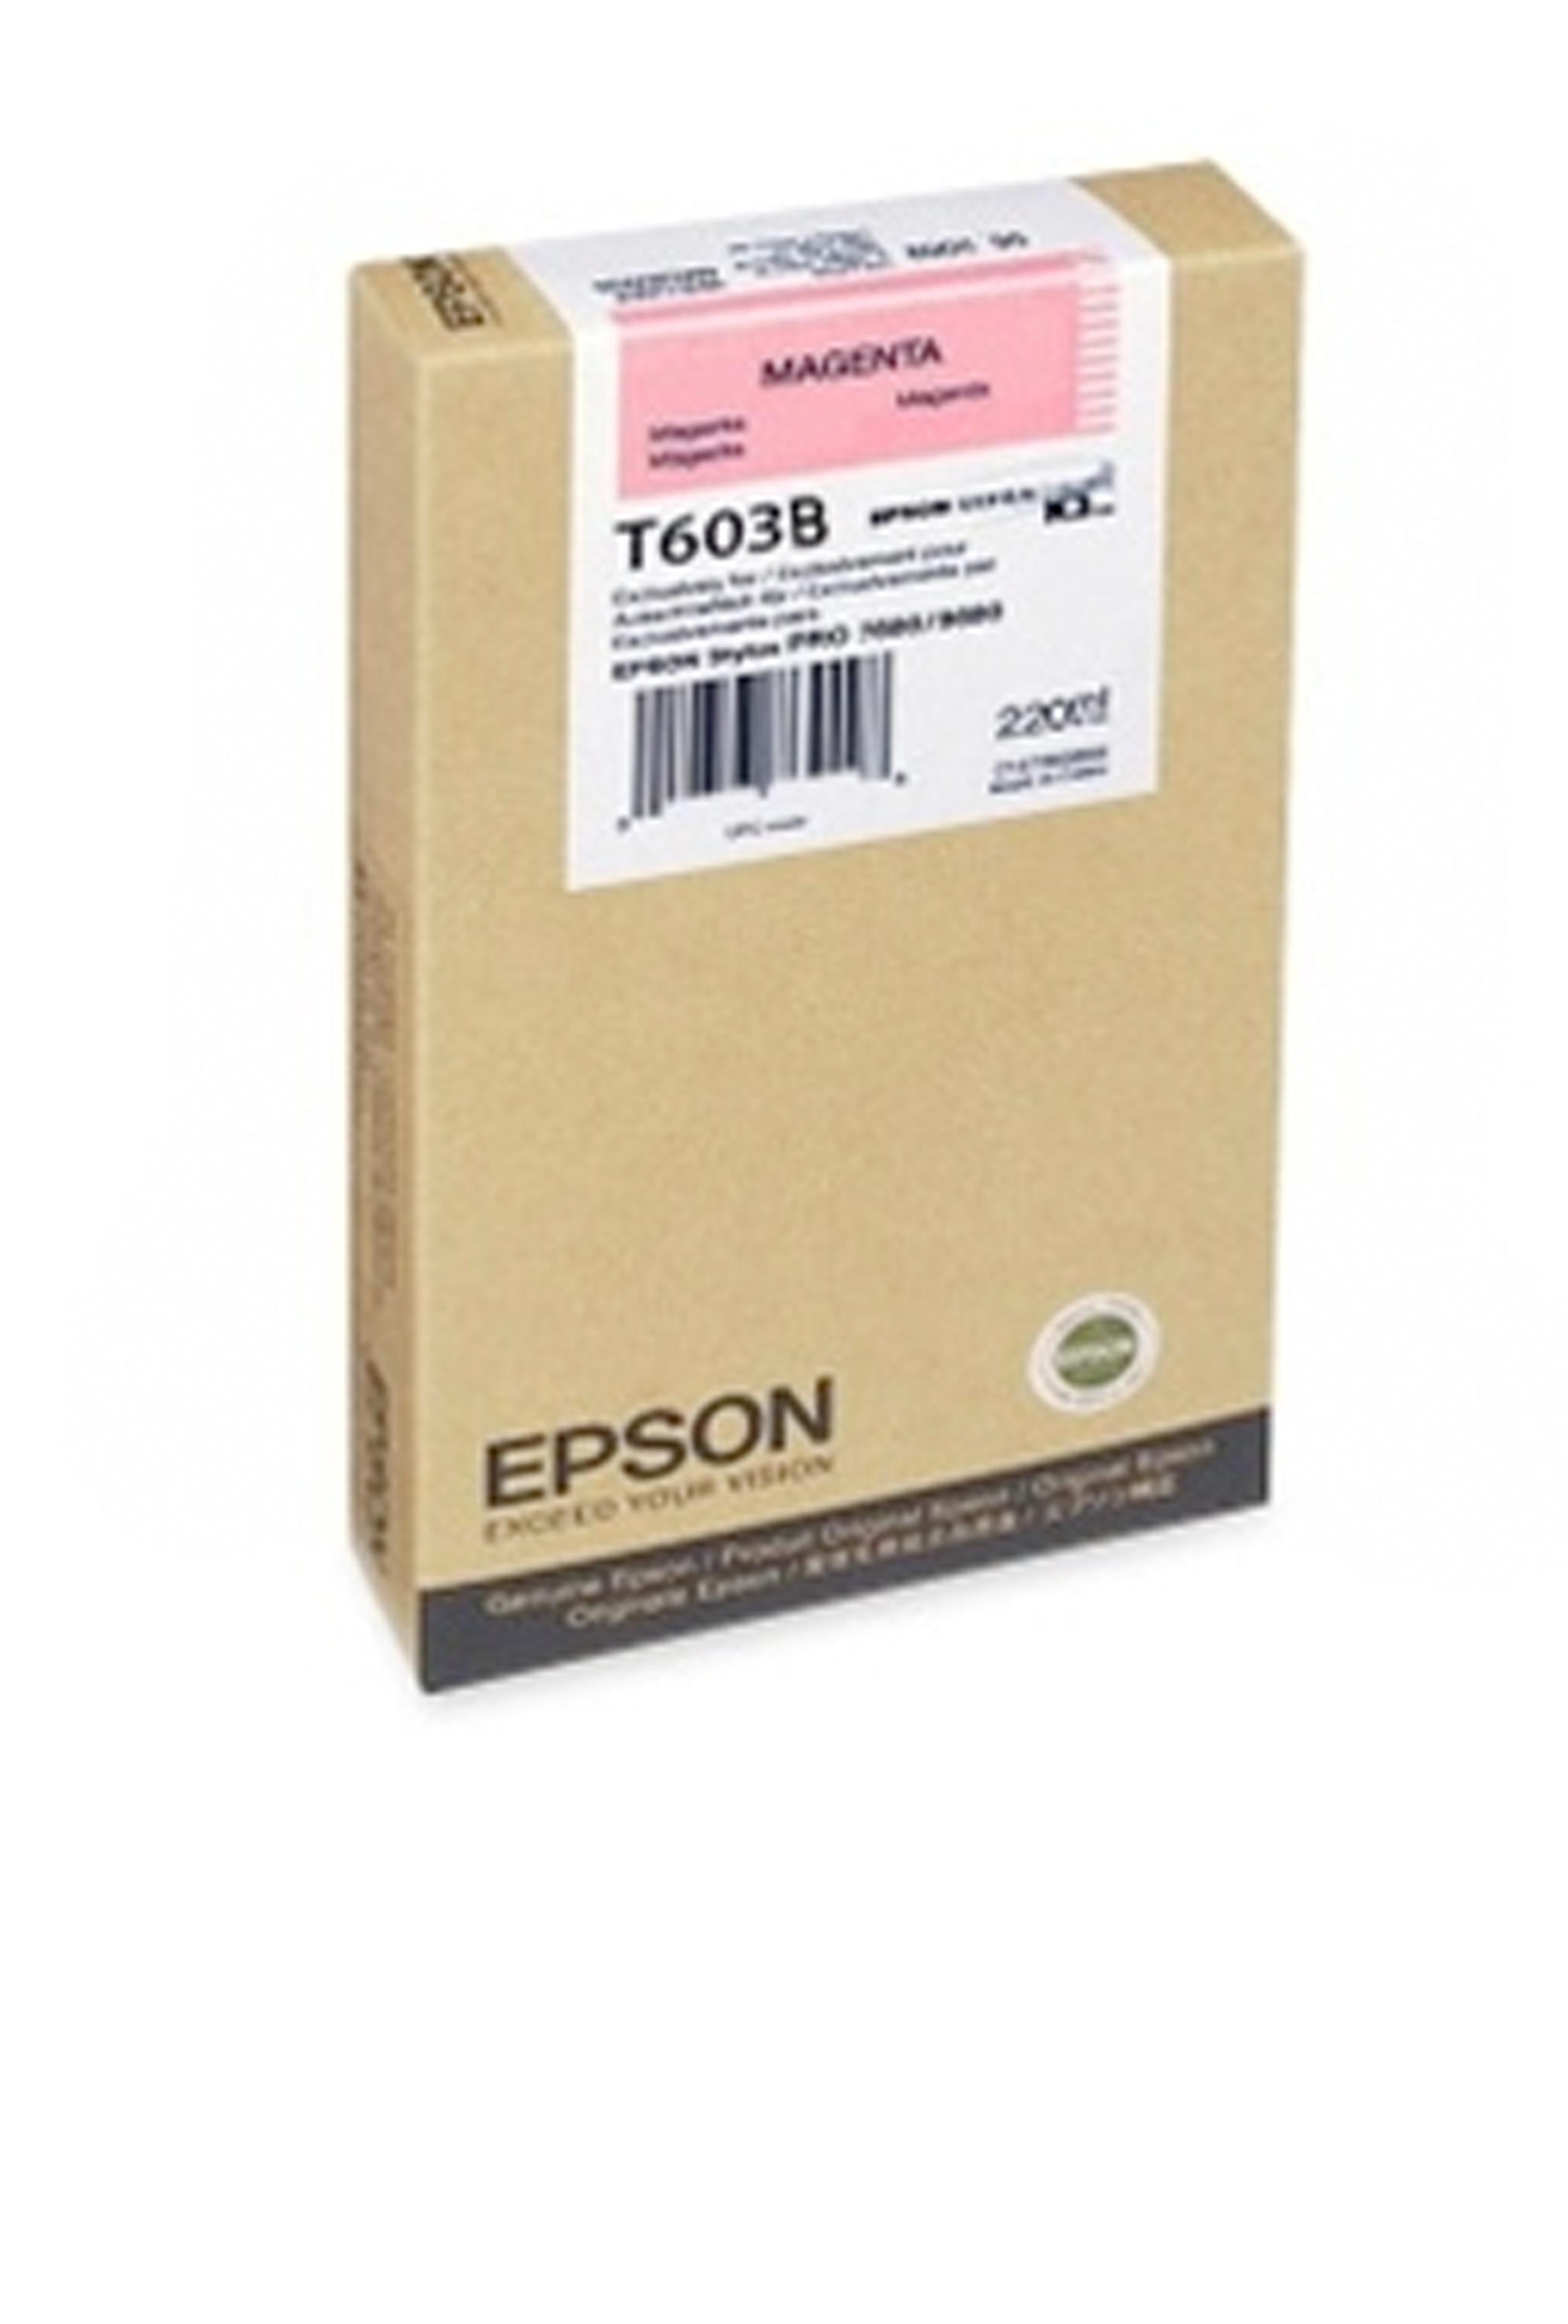 Epson EPSON SD MAGENTA INK (220 ML) (T603B00)